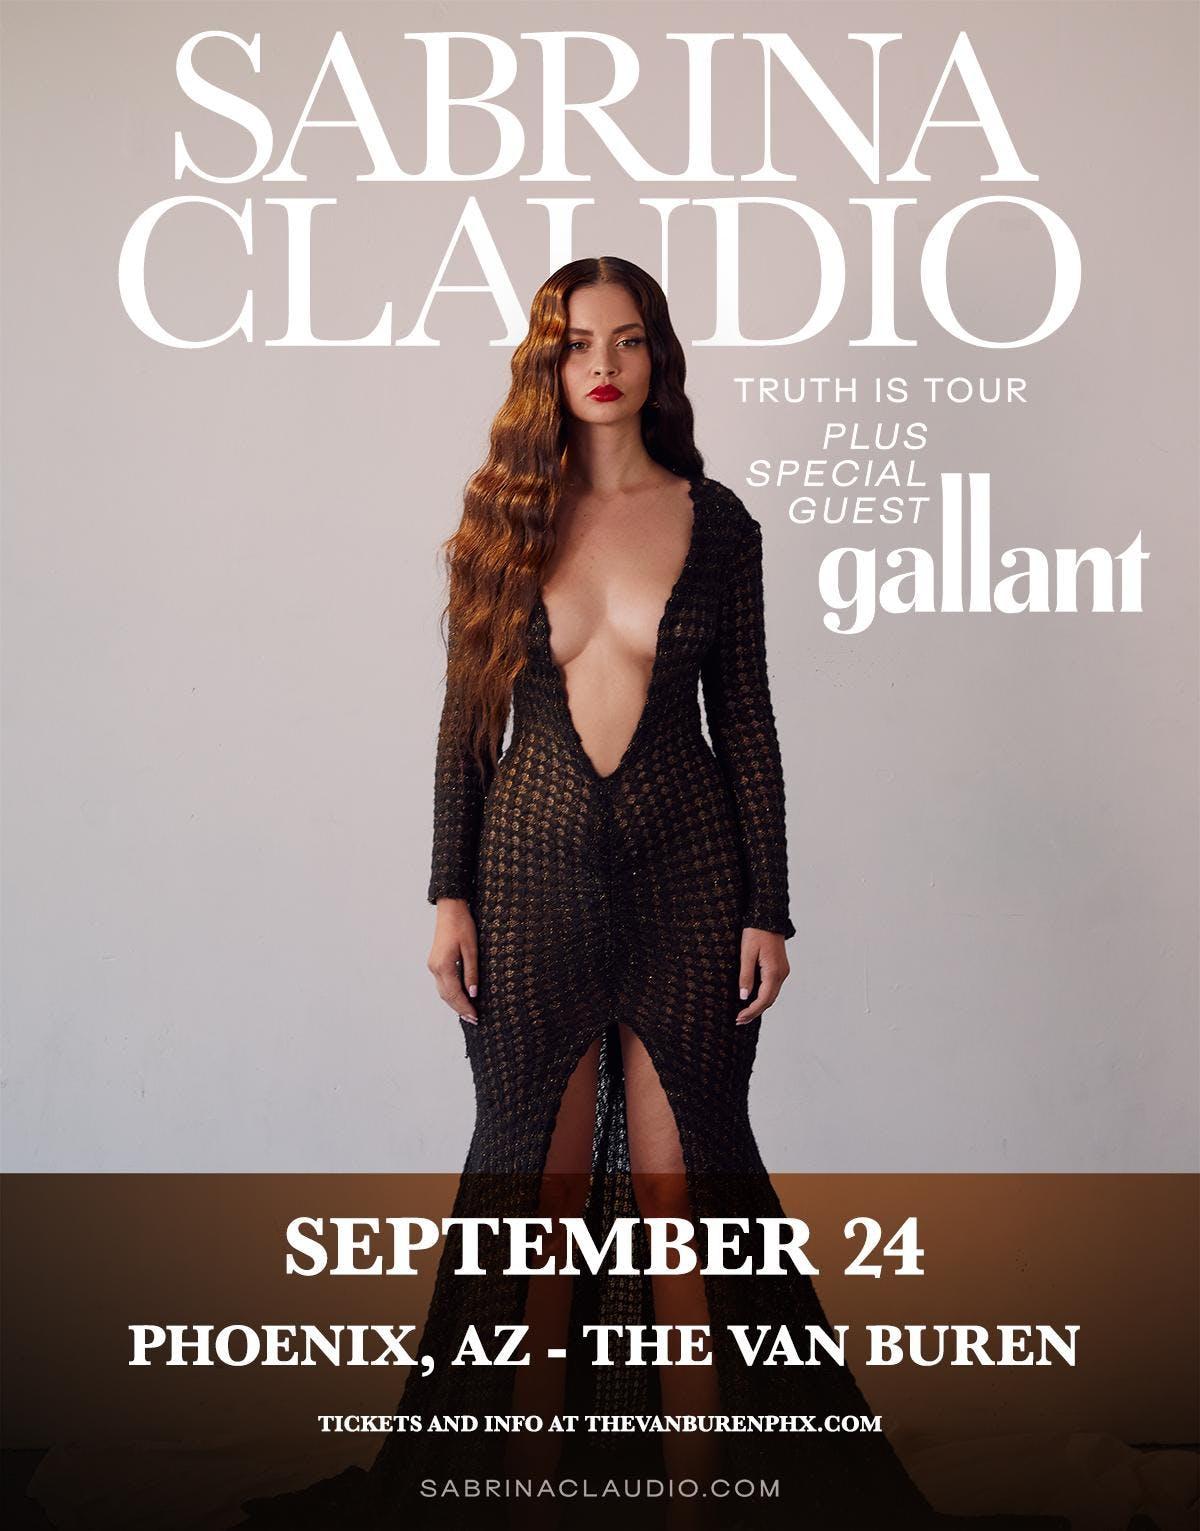 Sabrina Claudio - Truth Is Tour